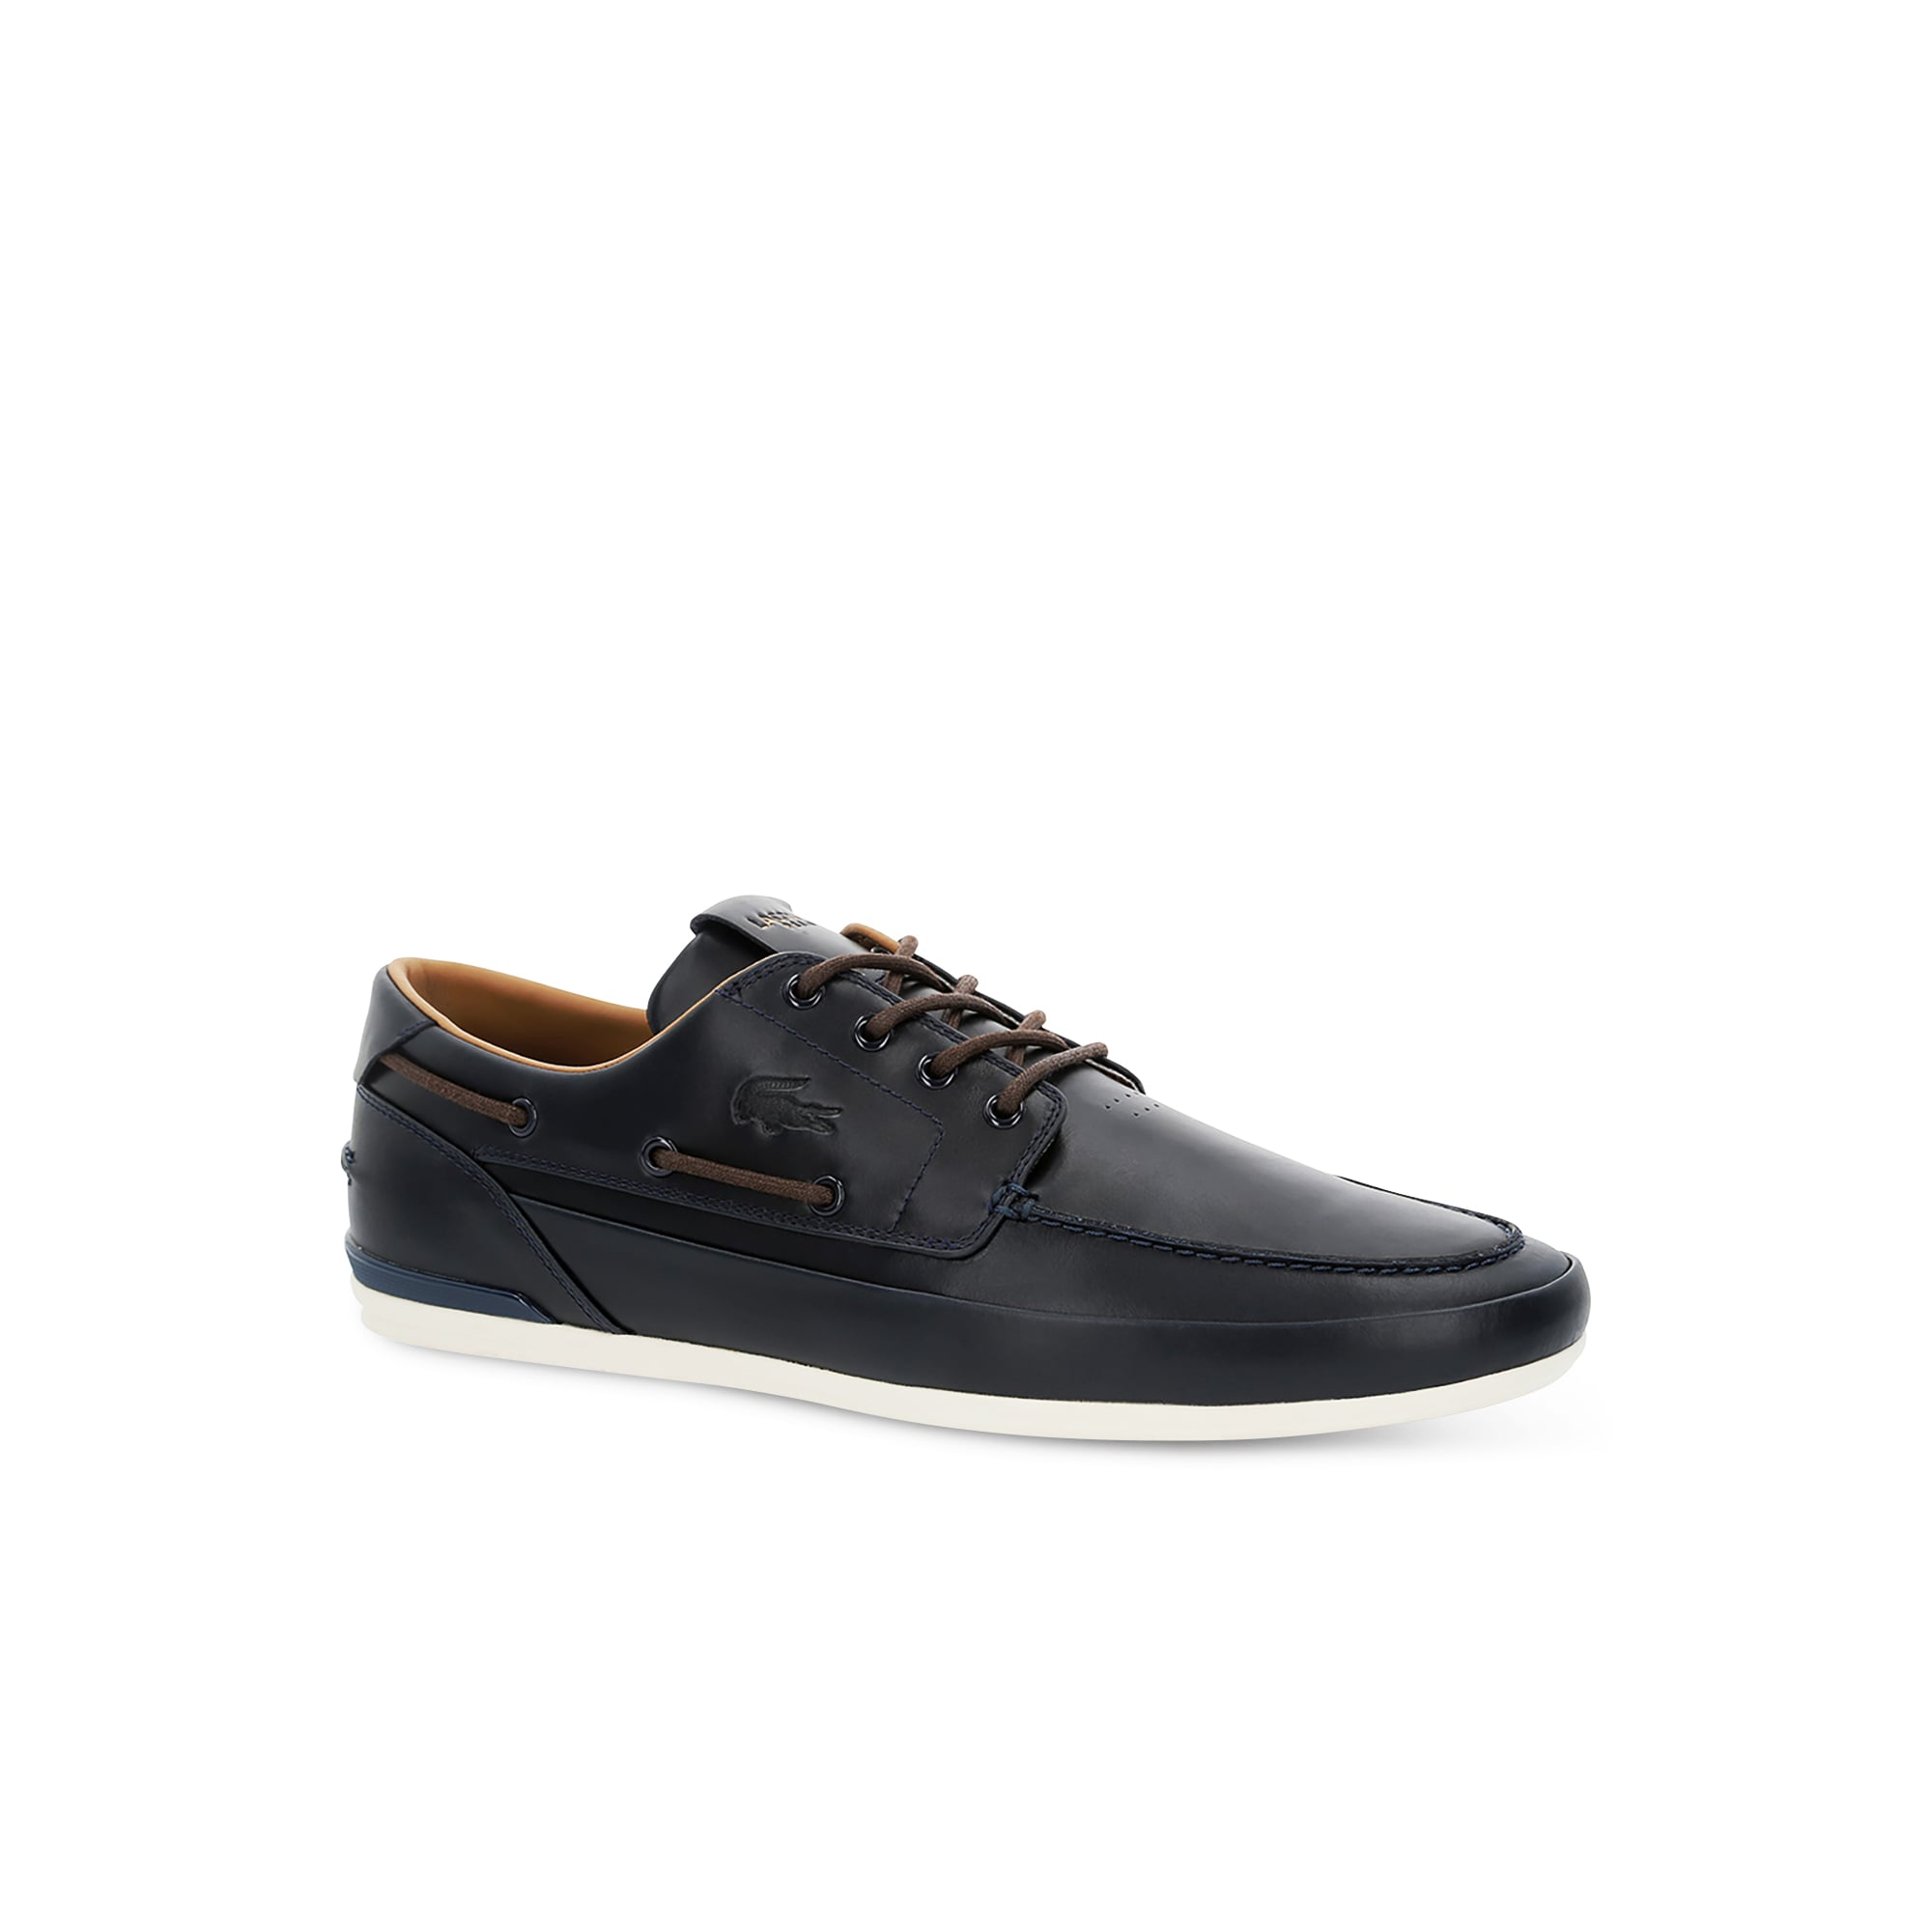 Marina Premium Leather Deck Shoes   LACOSTE